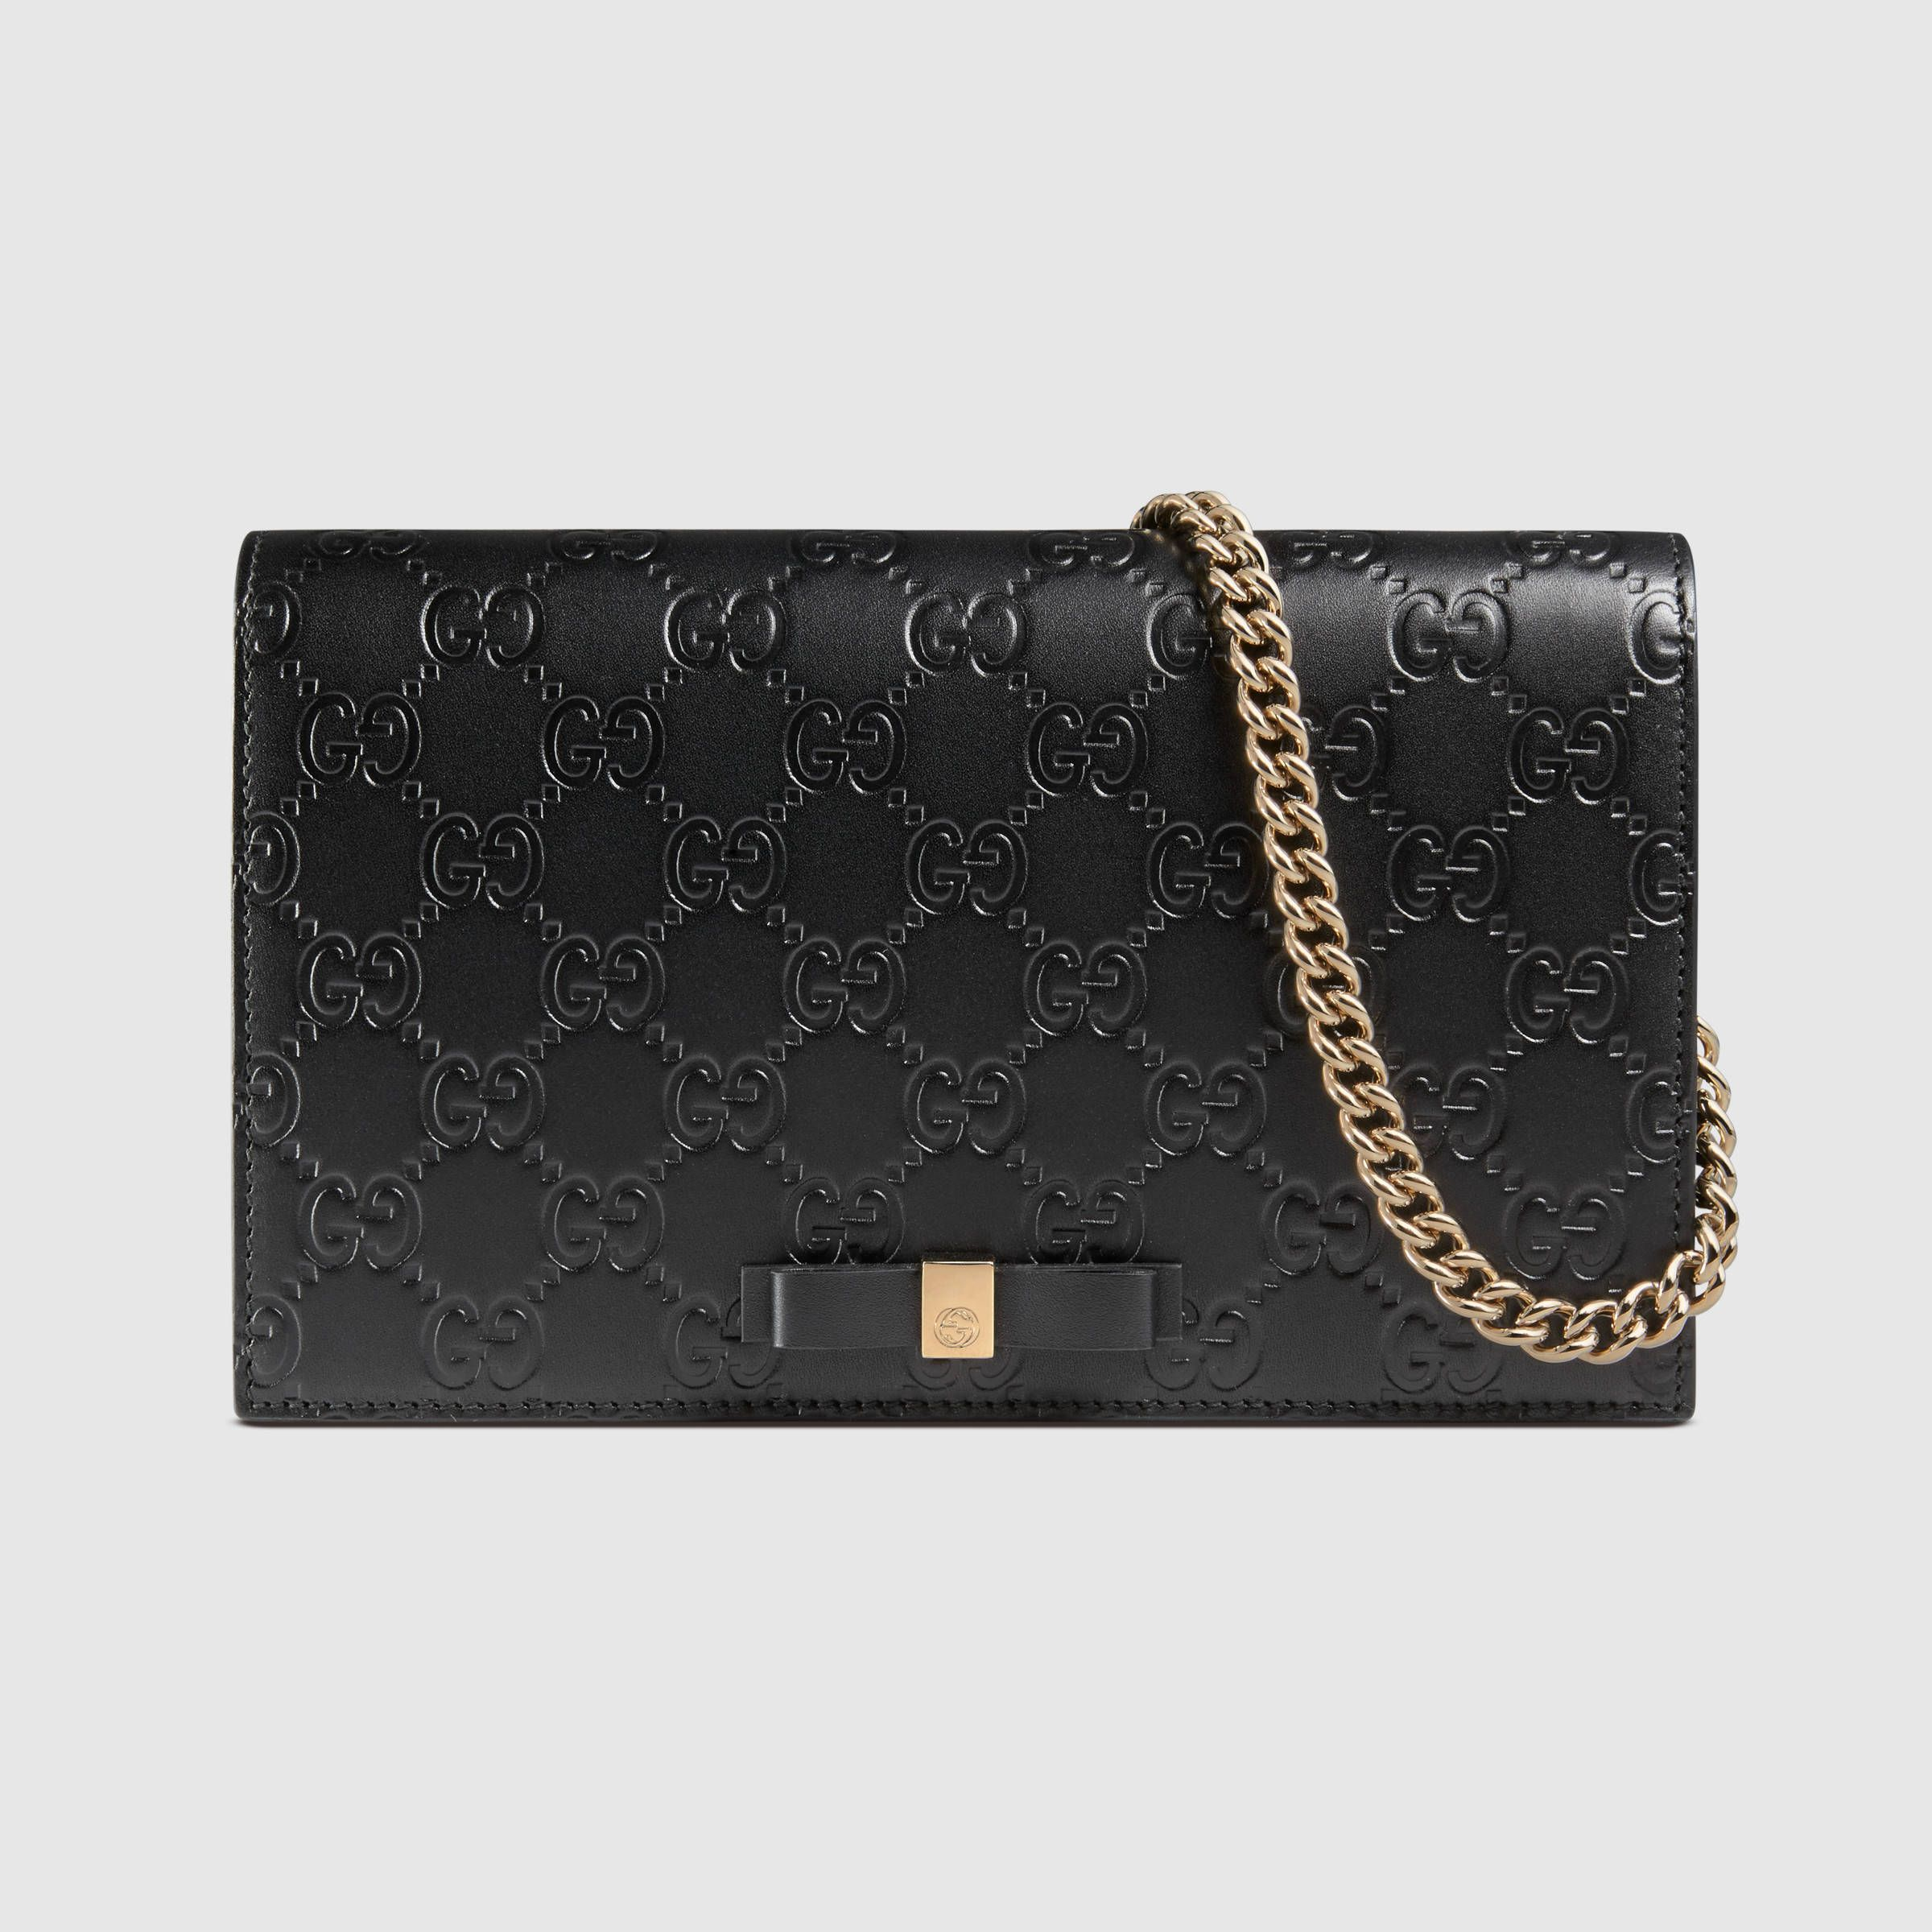 858b396606e7da Padlock continental wallet | Styling | Gucci padlock, Wallet chain ...